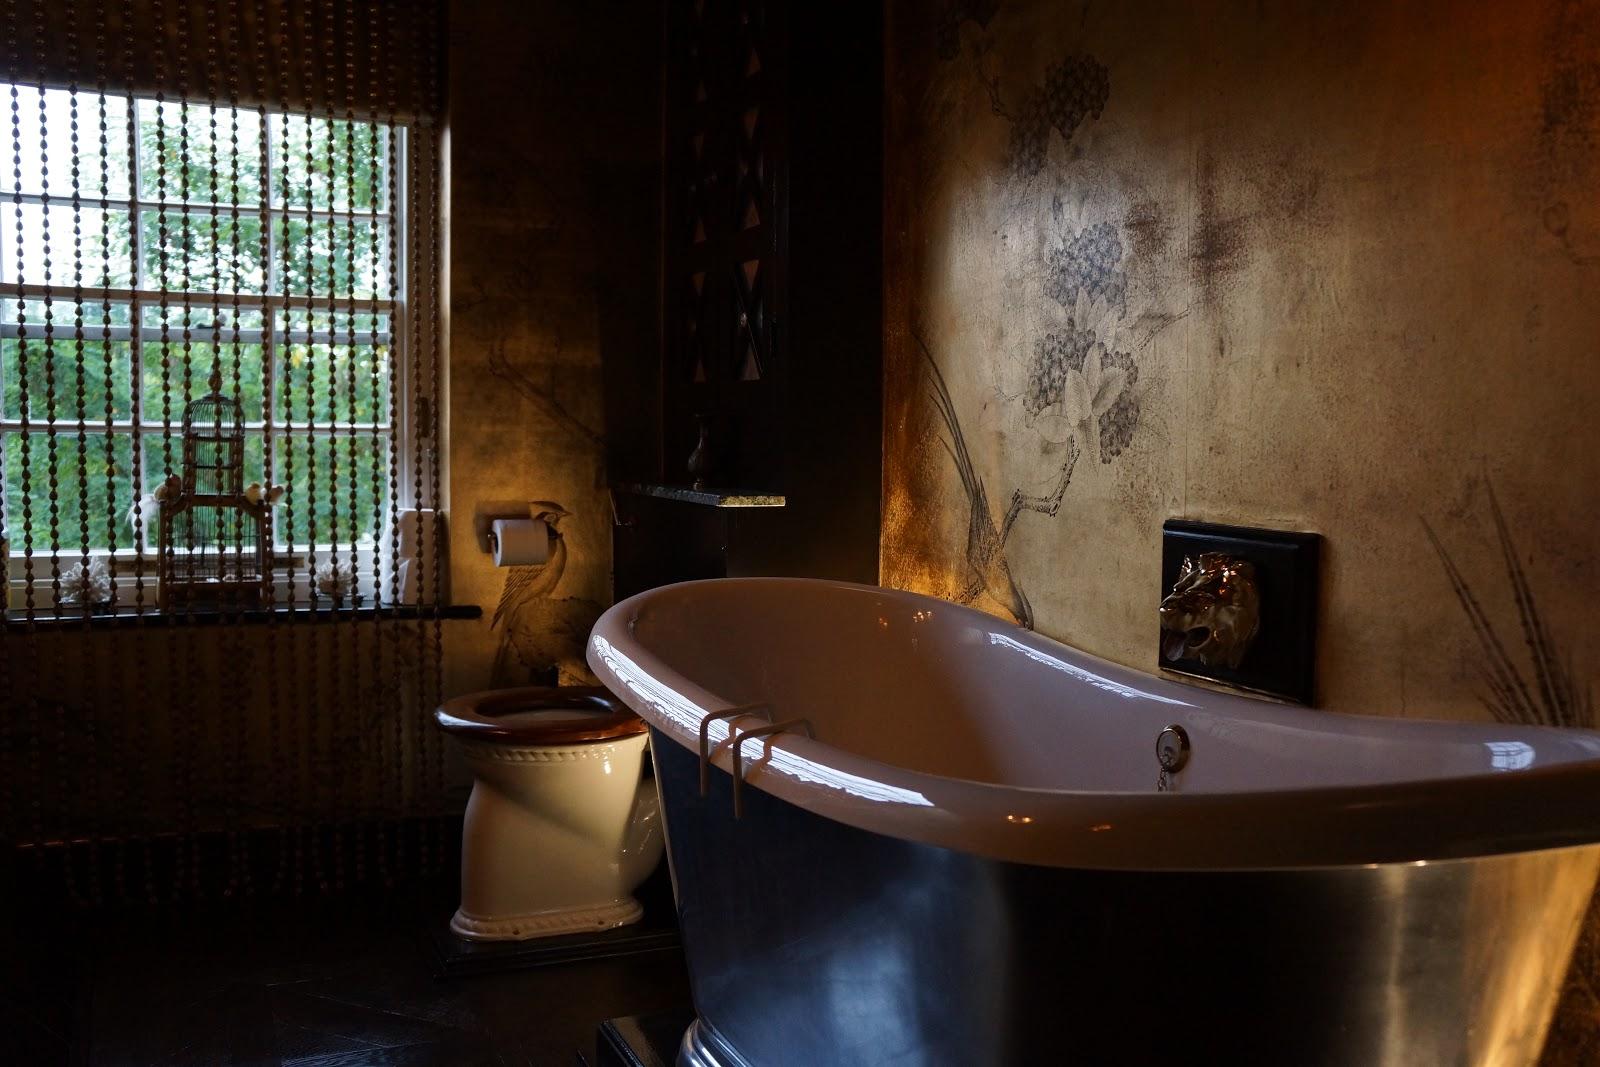 rolltop bathtub at 40 winks hotel